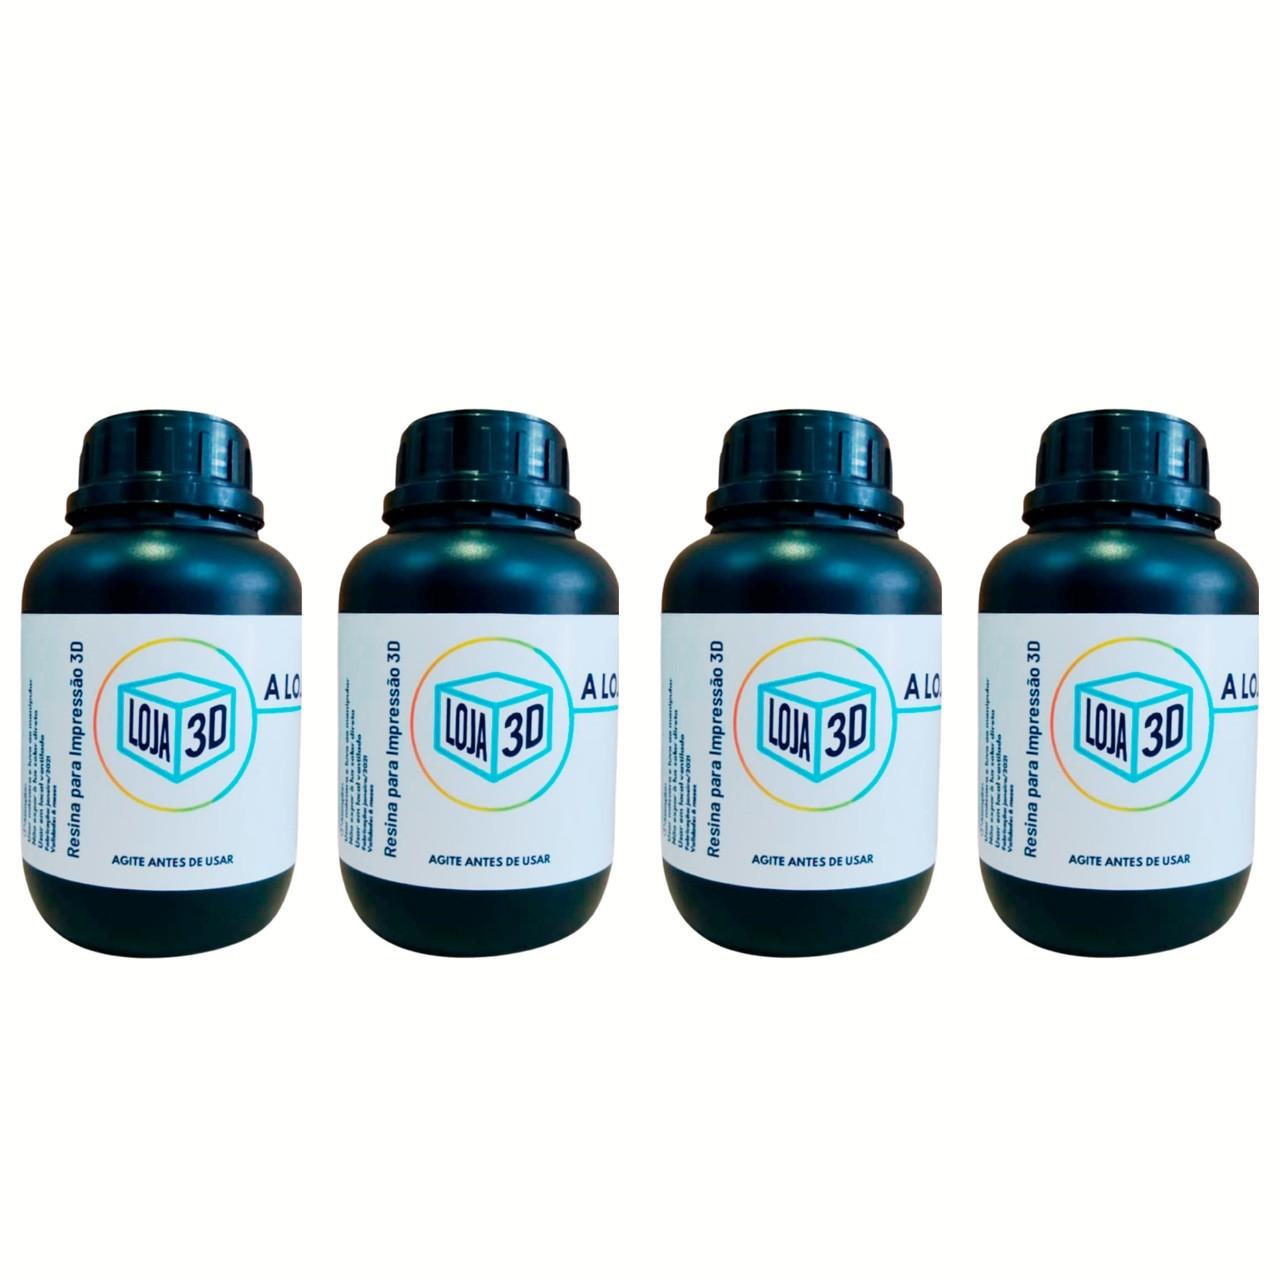 4 Resinas Pro - Standard - LCD/DLP - Loja 3D - 2 Litros